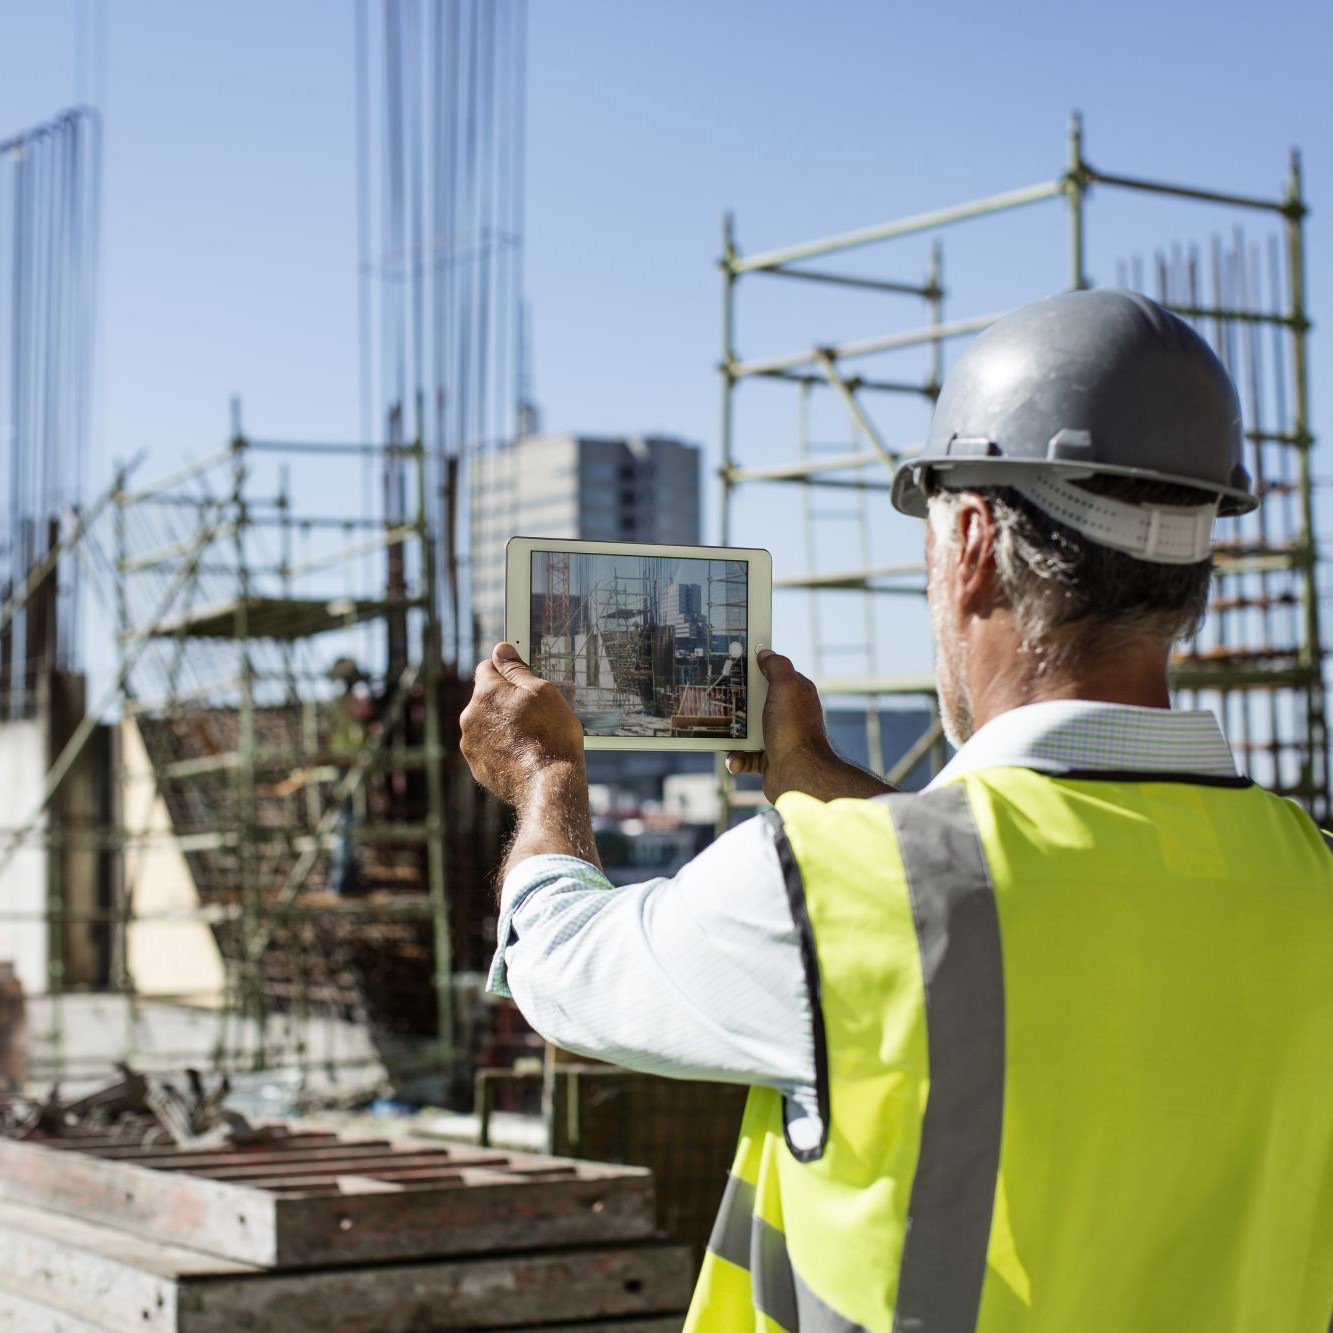 acuratete in proeictare, in procesul de constructie si in managementul calitatii, h4l, casa pentru viata, home 4 life